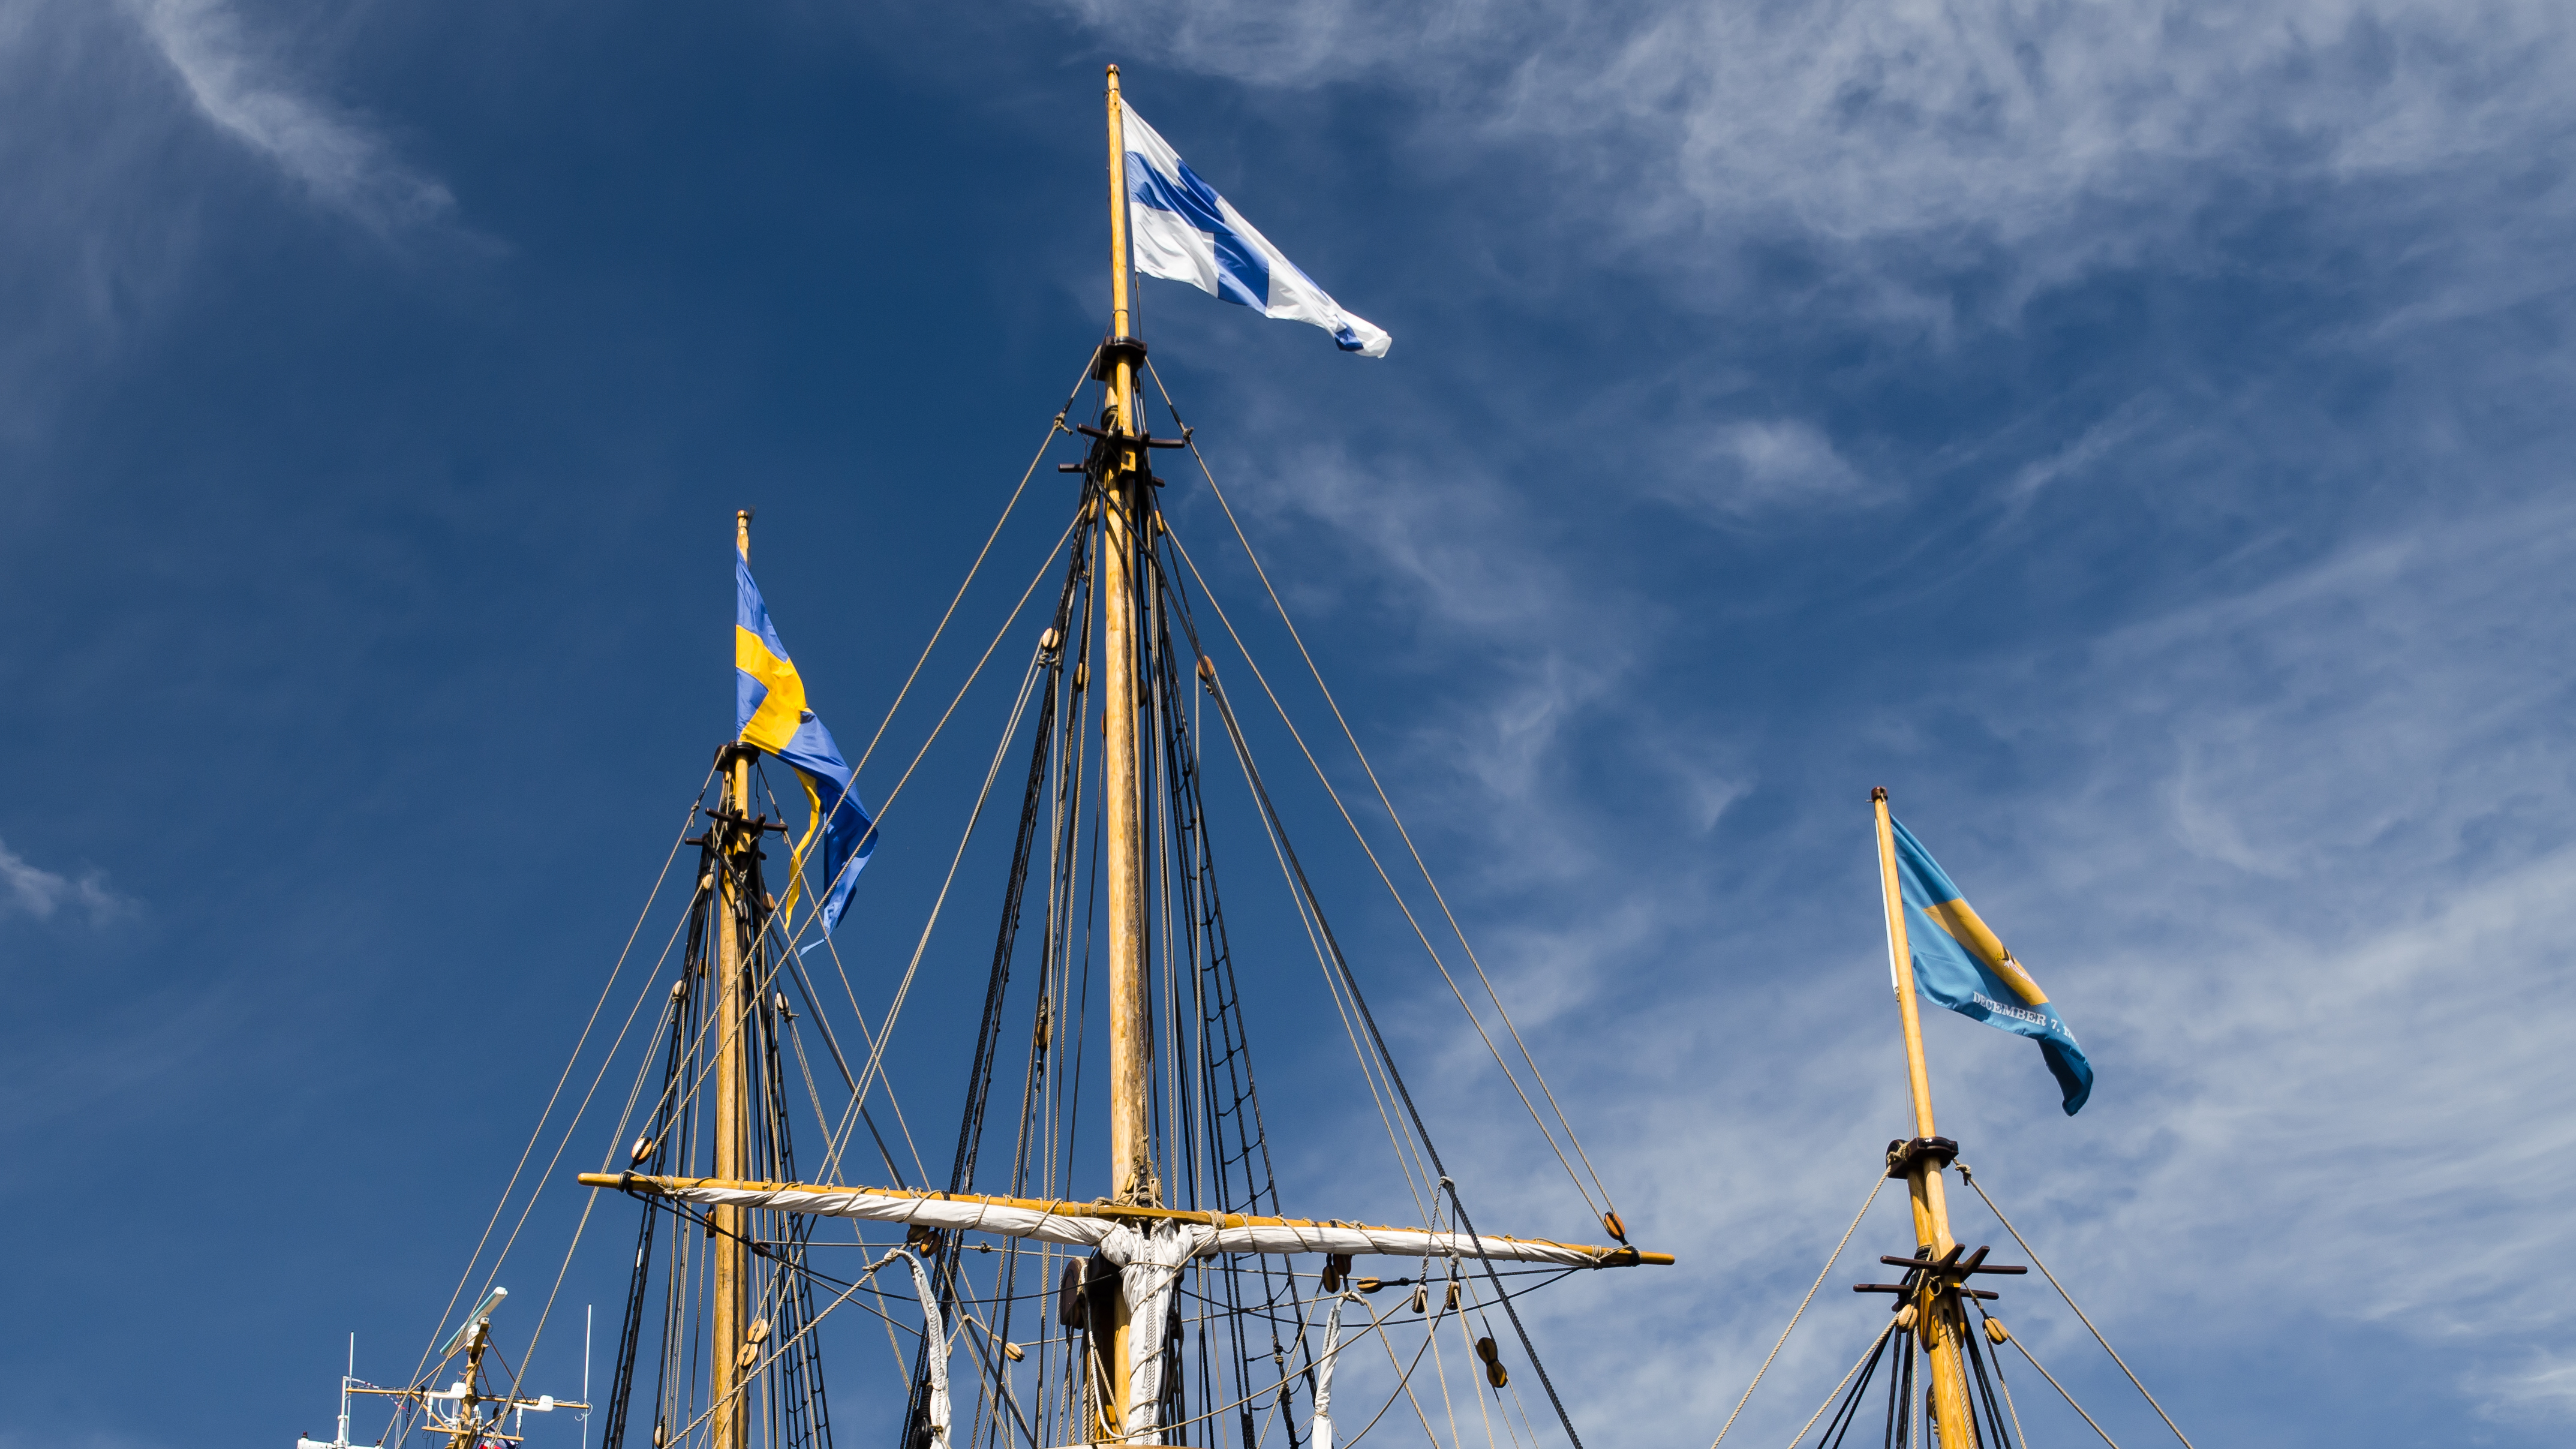 brown ship under blue sky